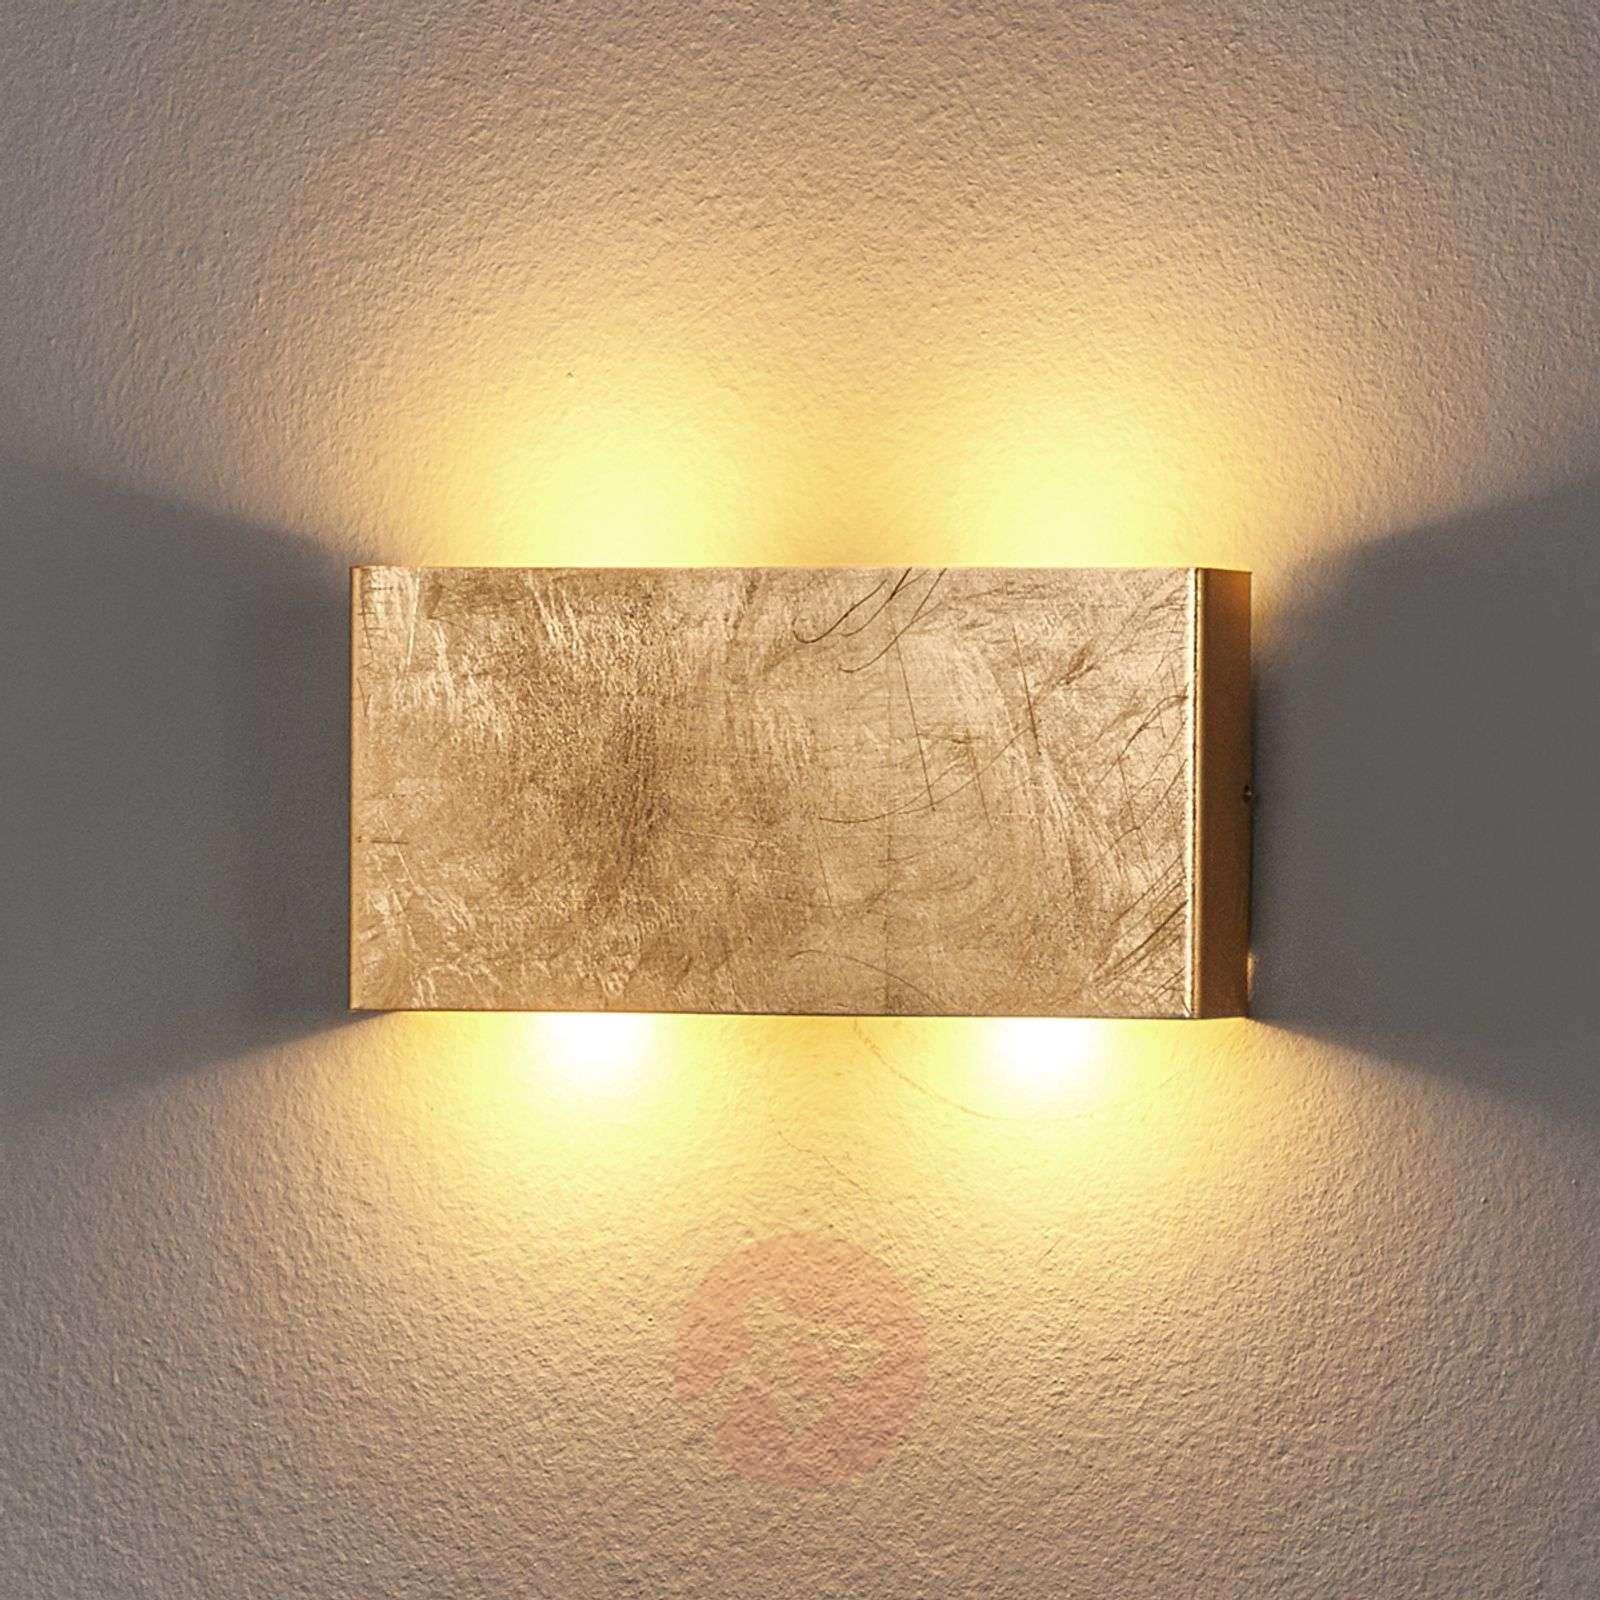 best website eefb5 aef53 Golden Maja LED wall light, dimmable